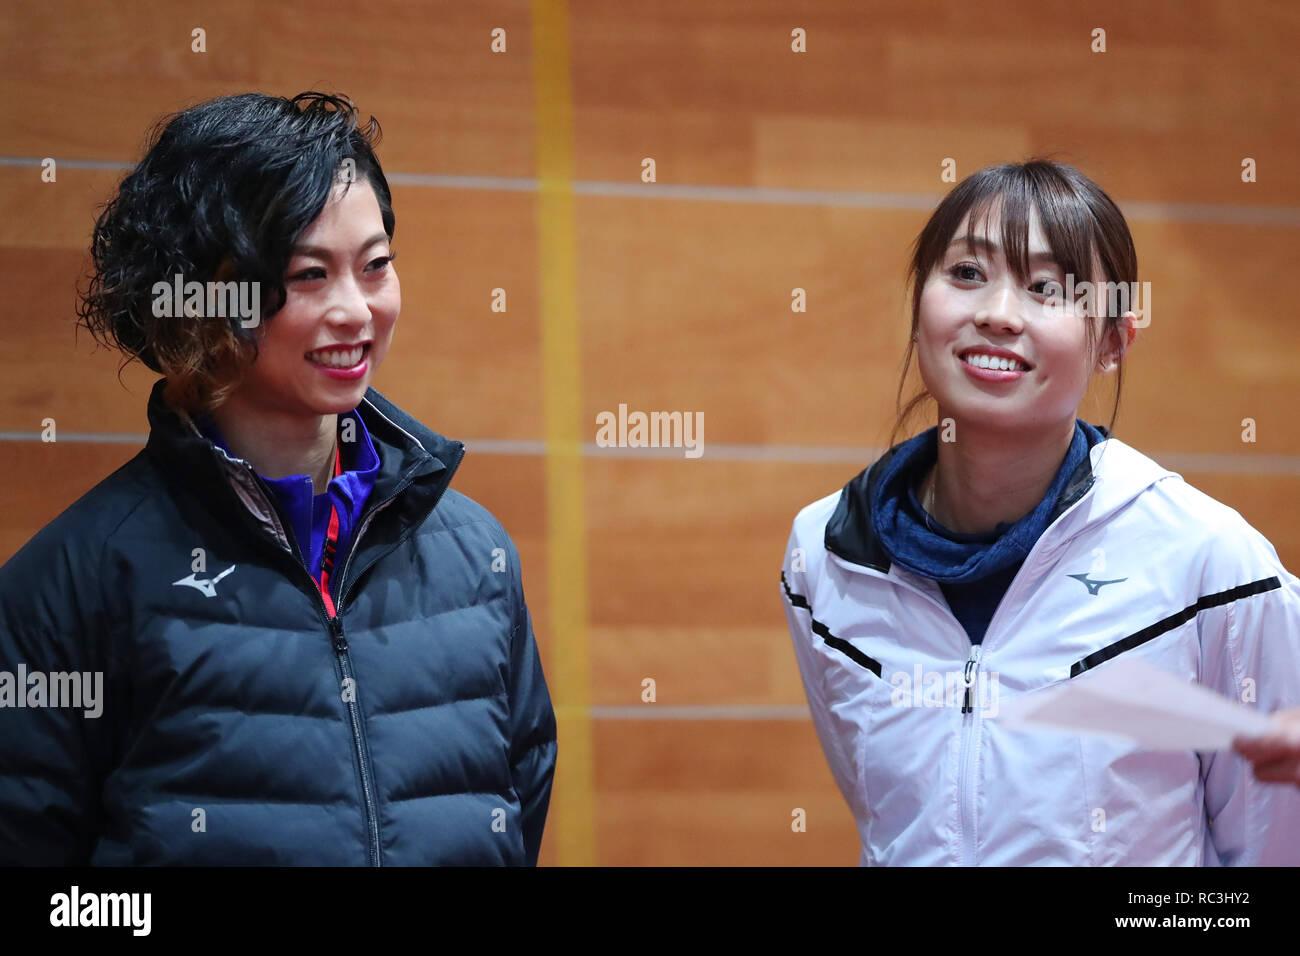 Tokyo, Japan. 13th Jan, 2019. (L-R) Maki Wada, Kana Ichikawa Athletics : JAAF women's relay sprinter selection at JISS in Tokyo, Japan . Credit: Yohei Osada/AFLO SPORT/Alamy Live News - Stock Image